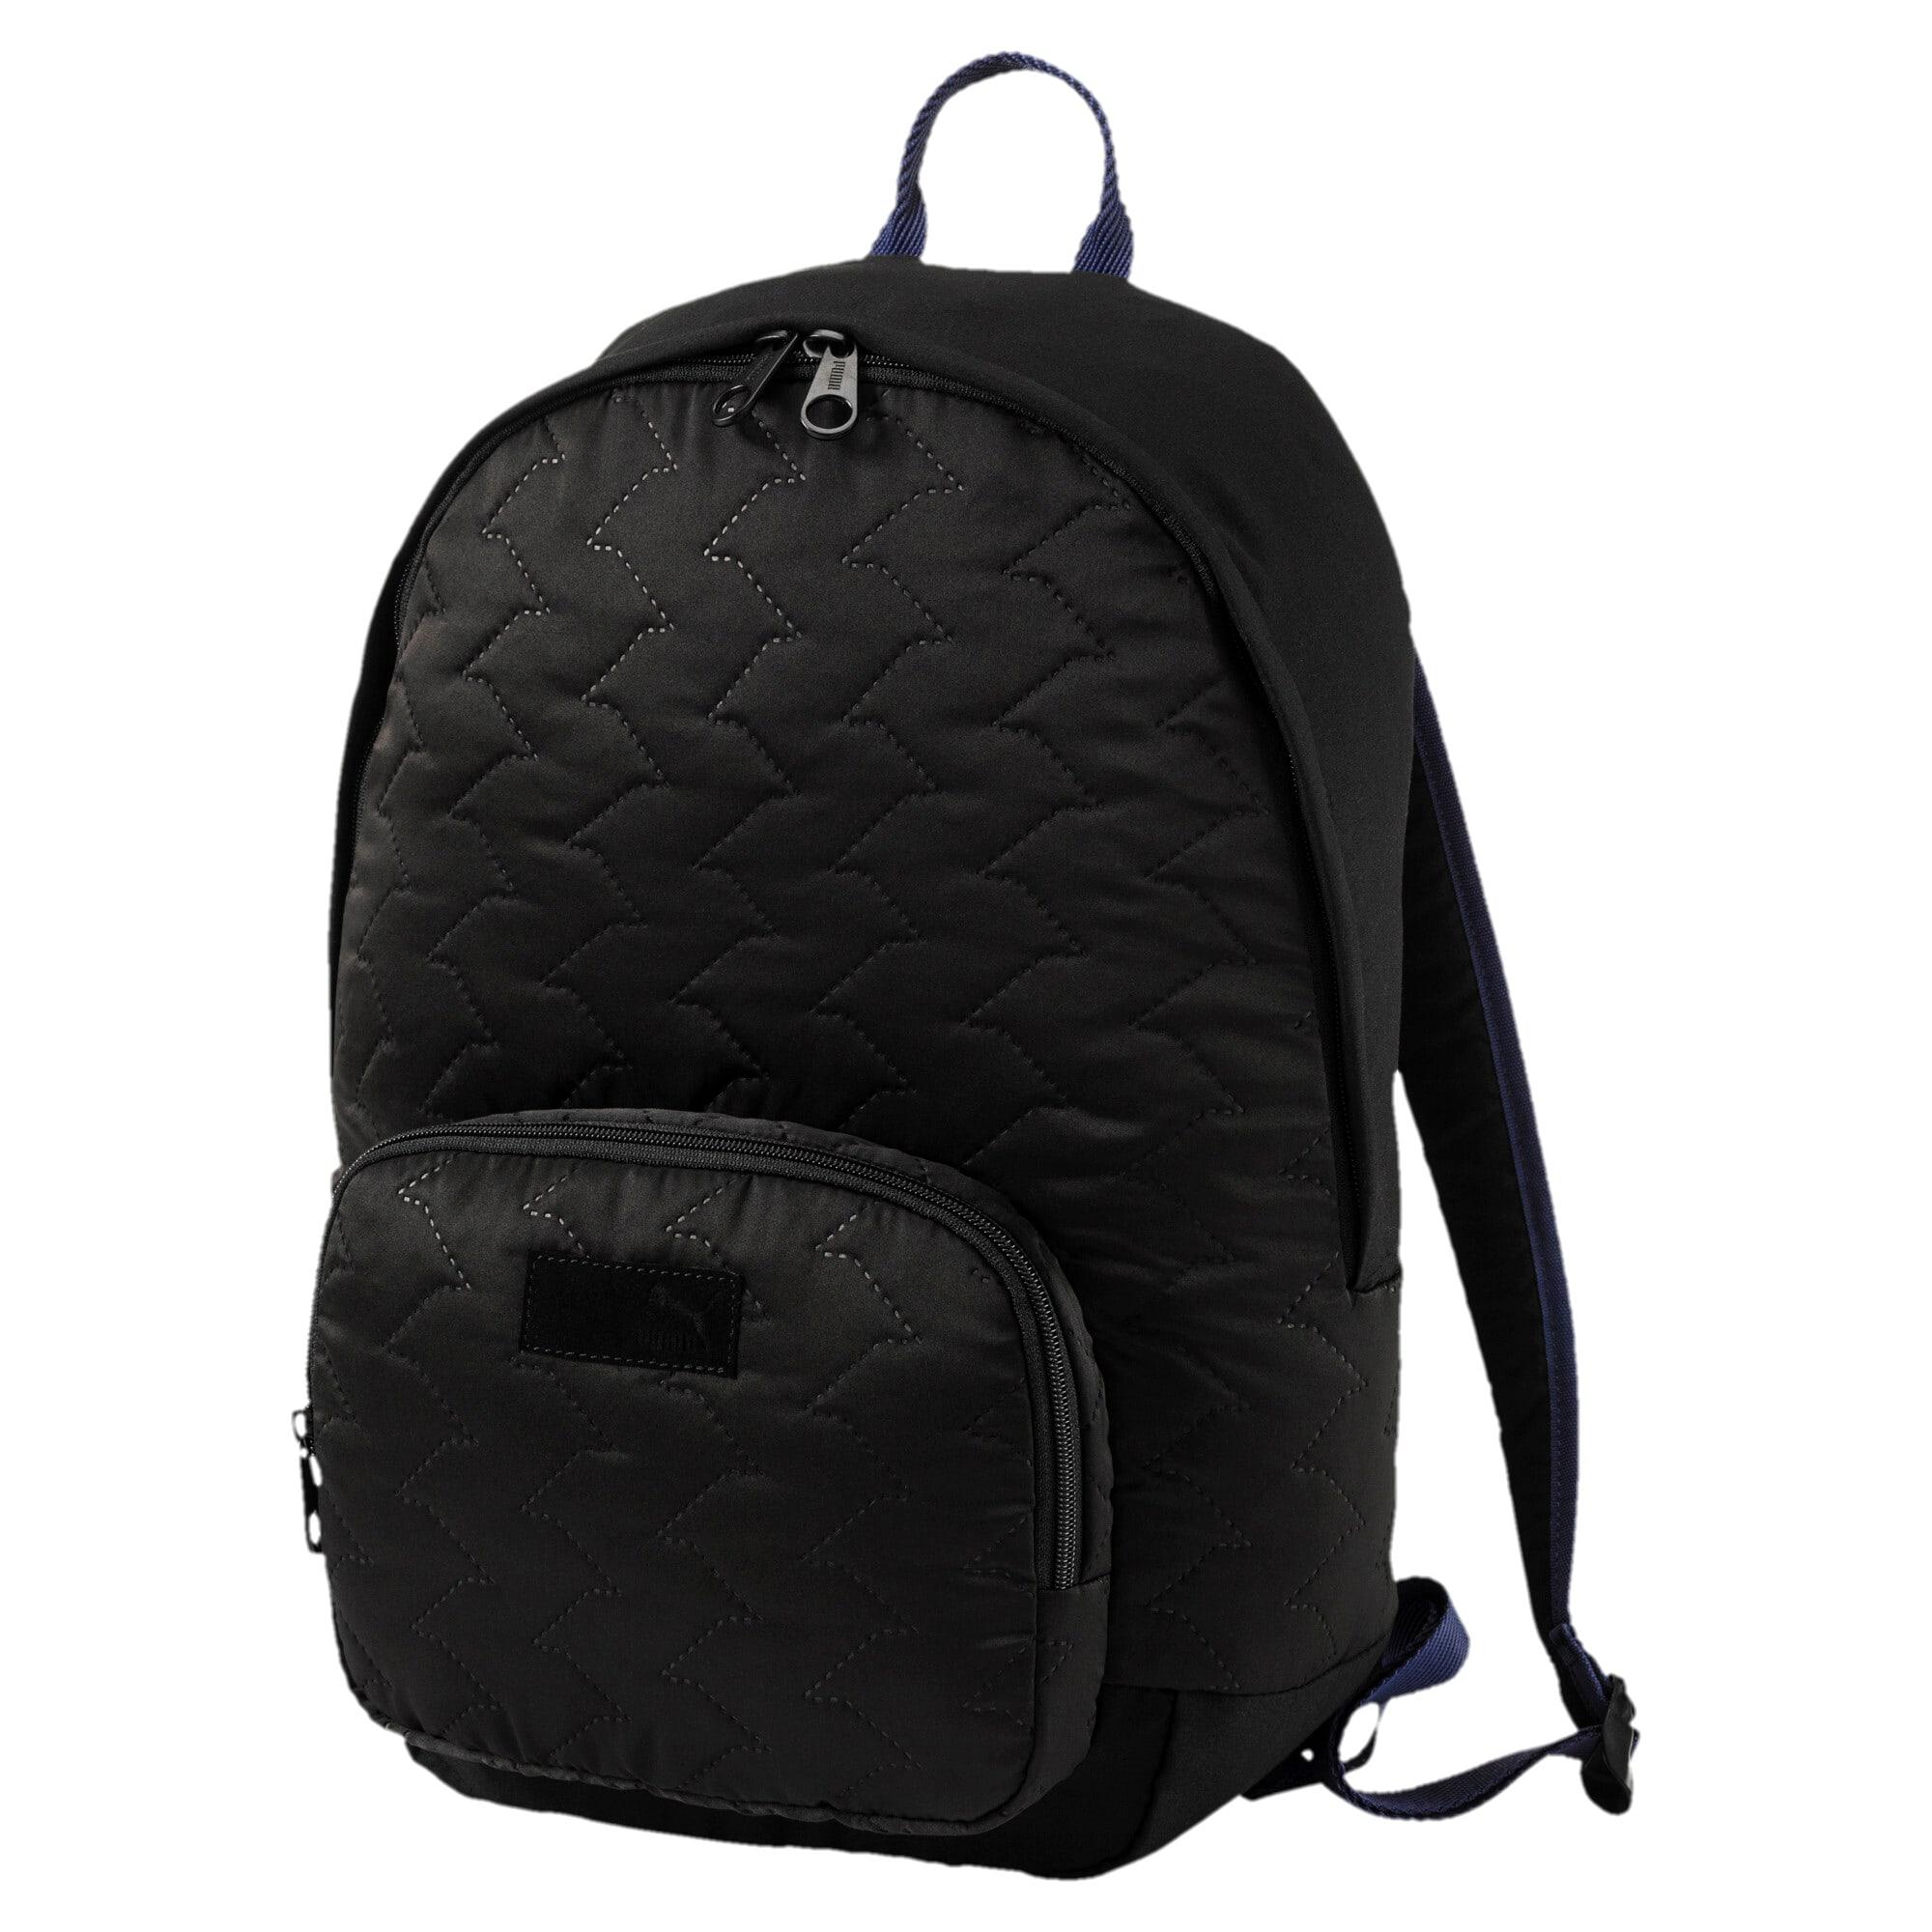 Thumbnail 1 of Women's Prime Lux Backpack, Puma Black-Blue Depths, medium-IND